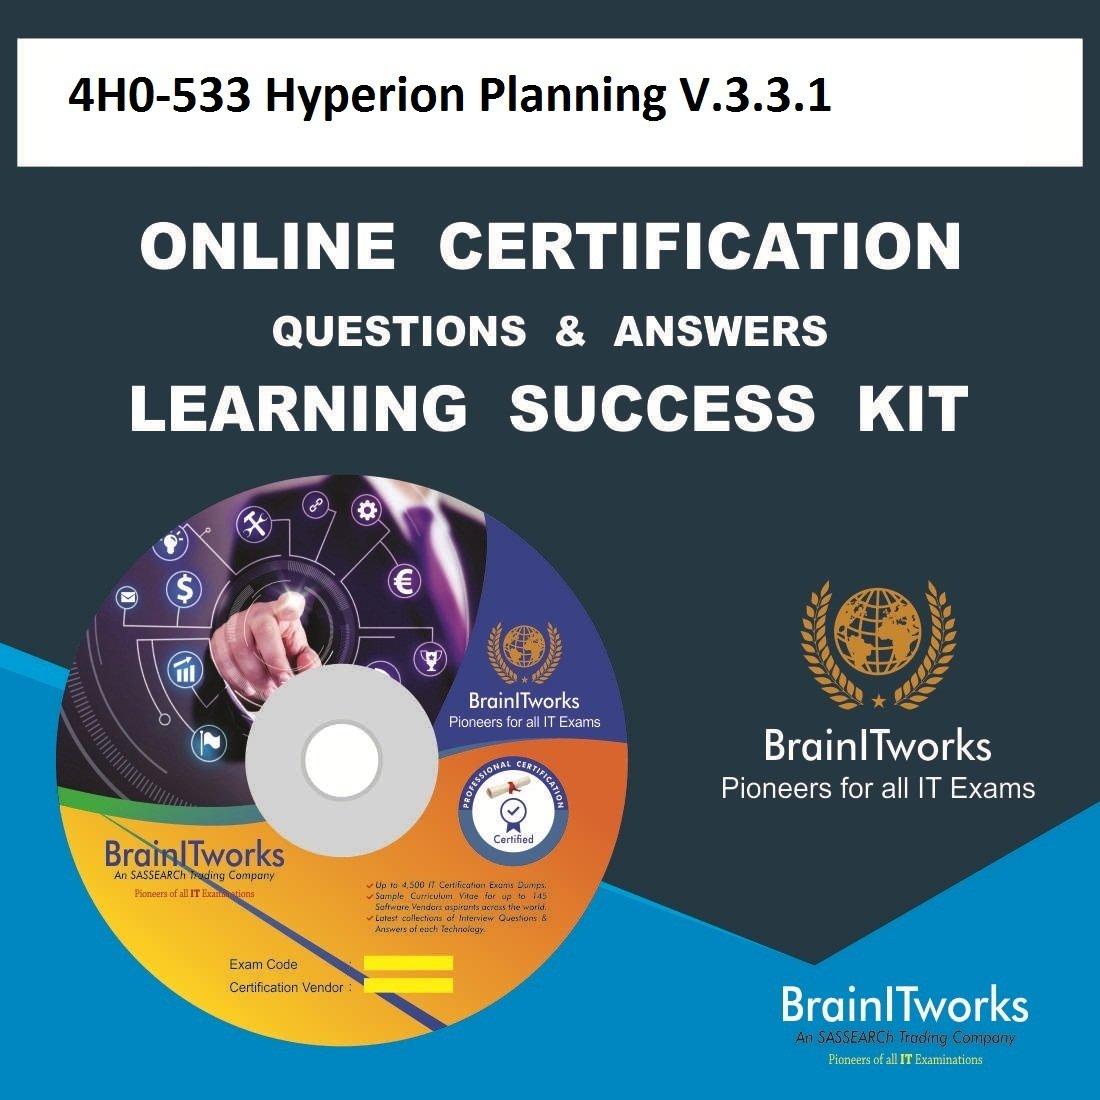 4h0 533 Hyperion Planning V331 Online Certification Learning Made